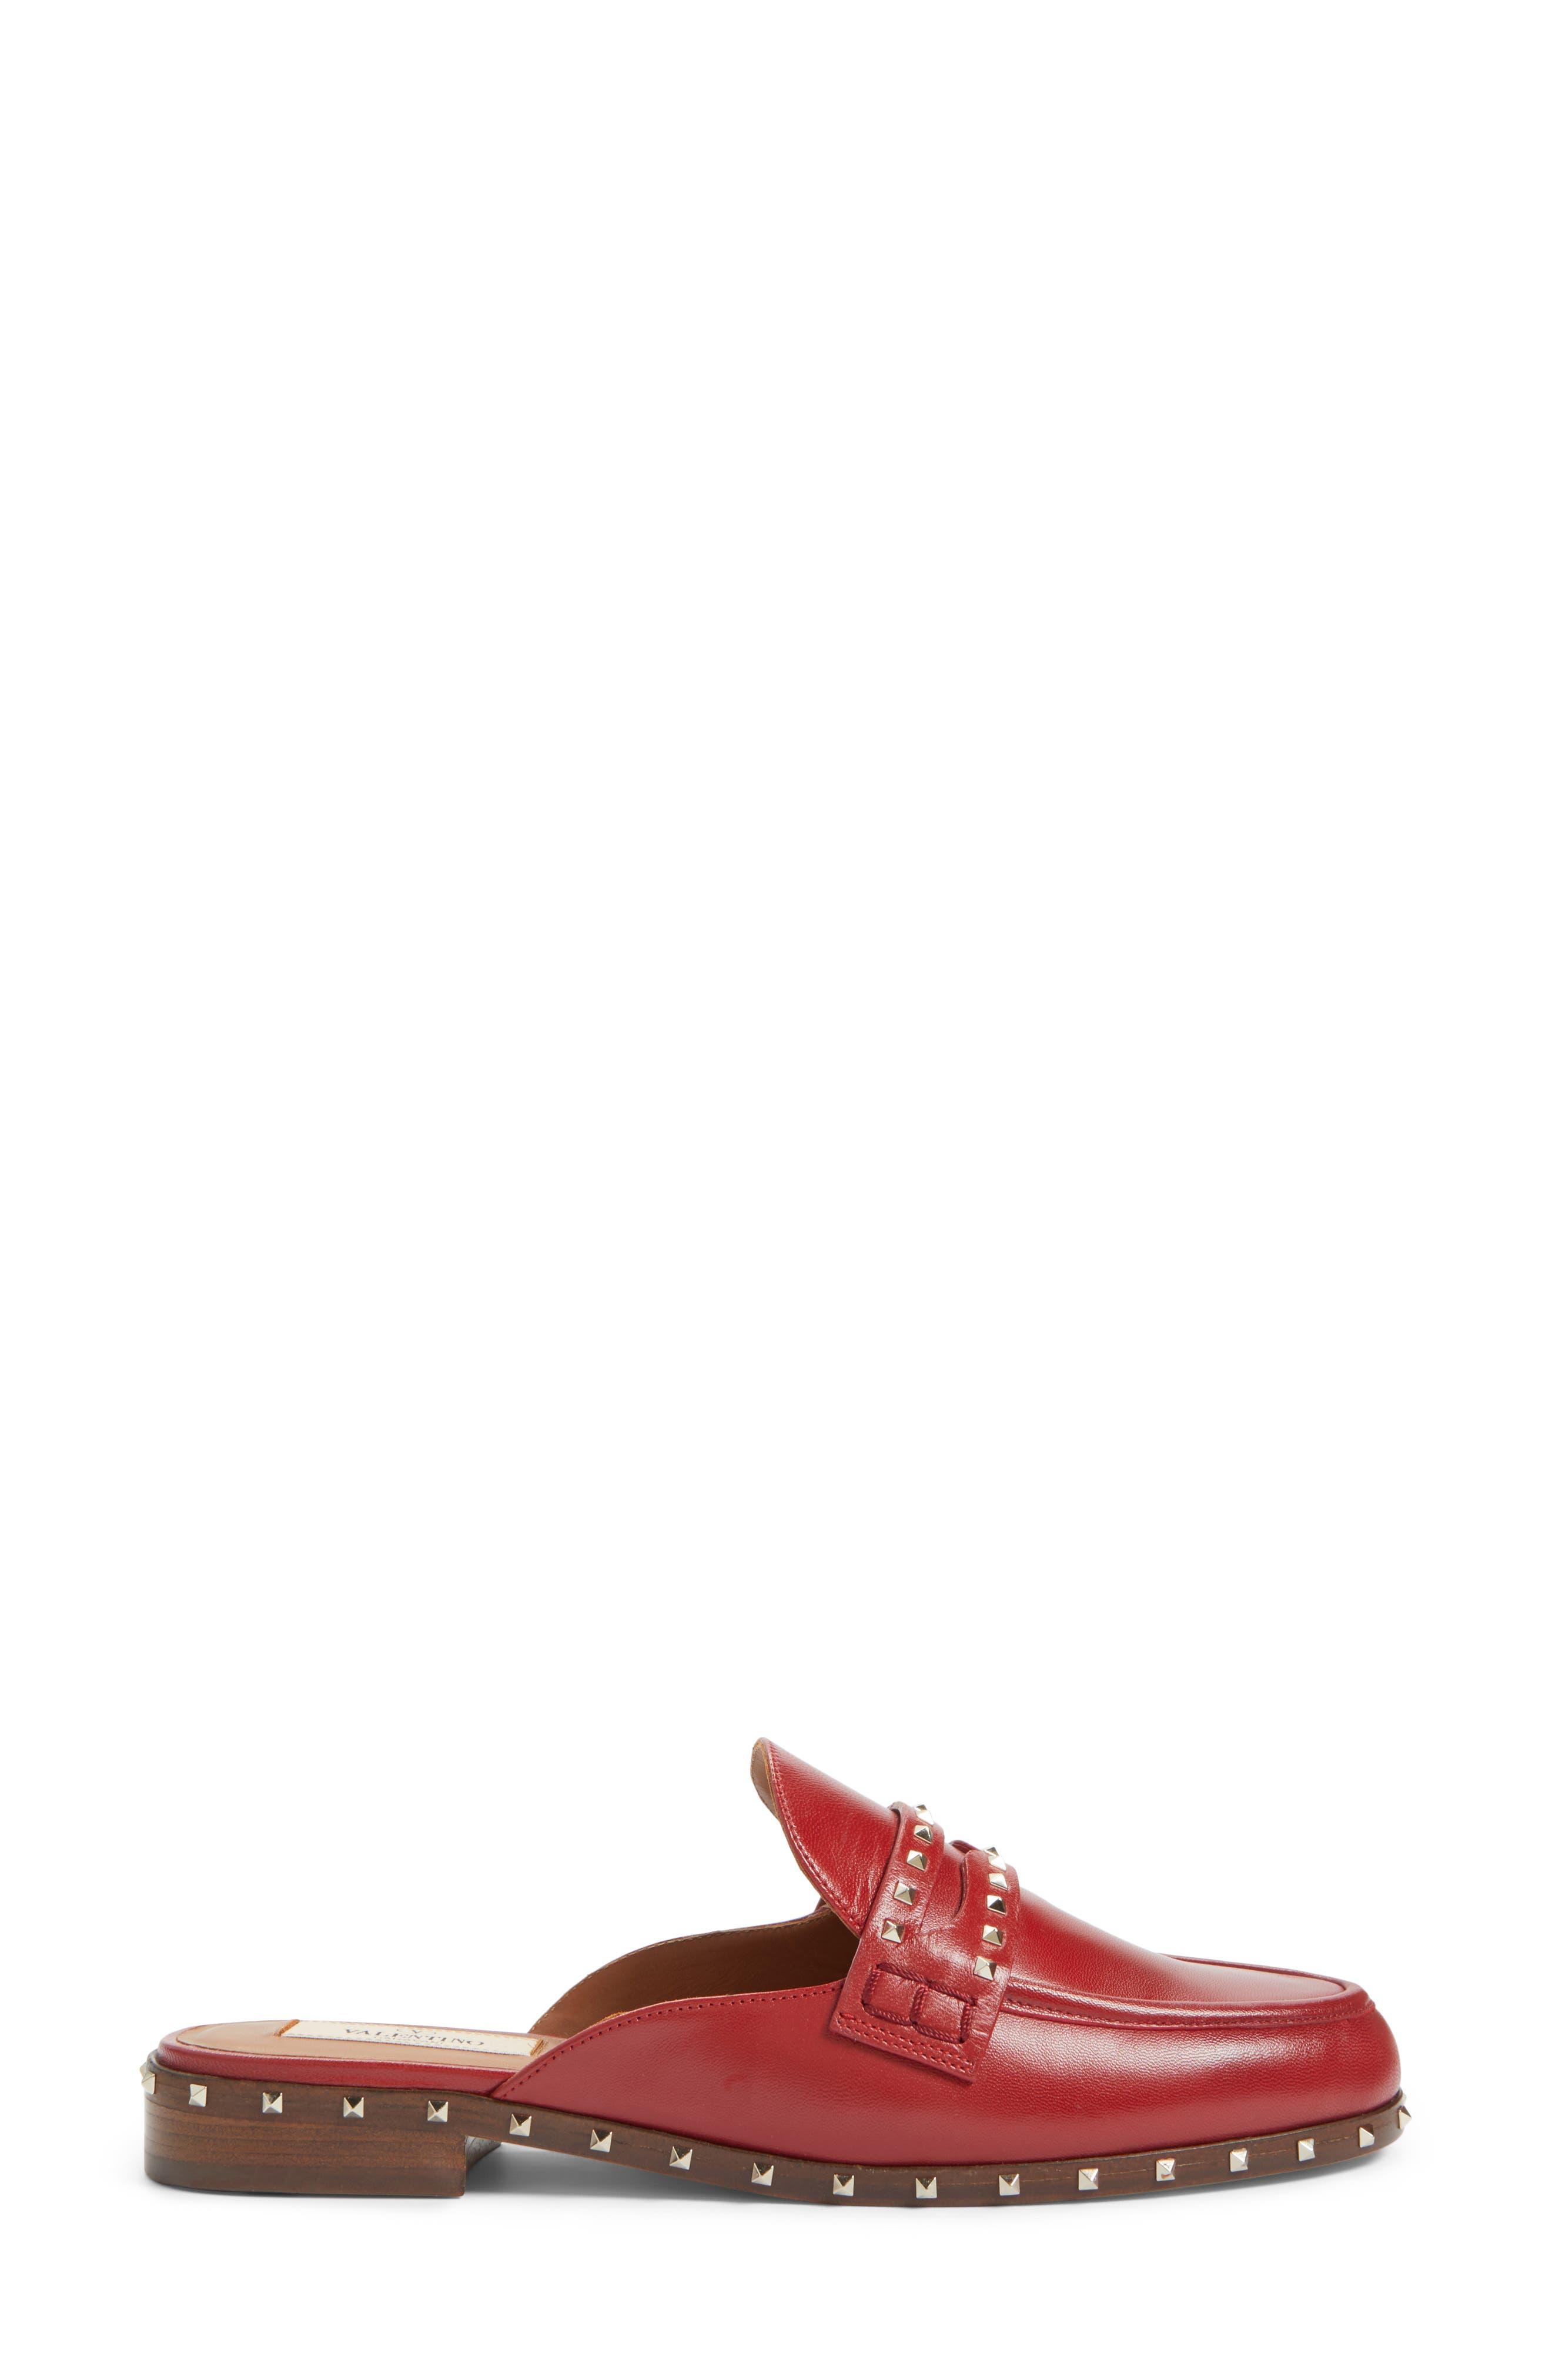 Soul Rockstud Loafer Mule,                             Alternate thumbnail 3, color,                             610